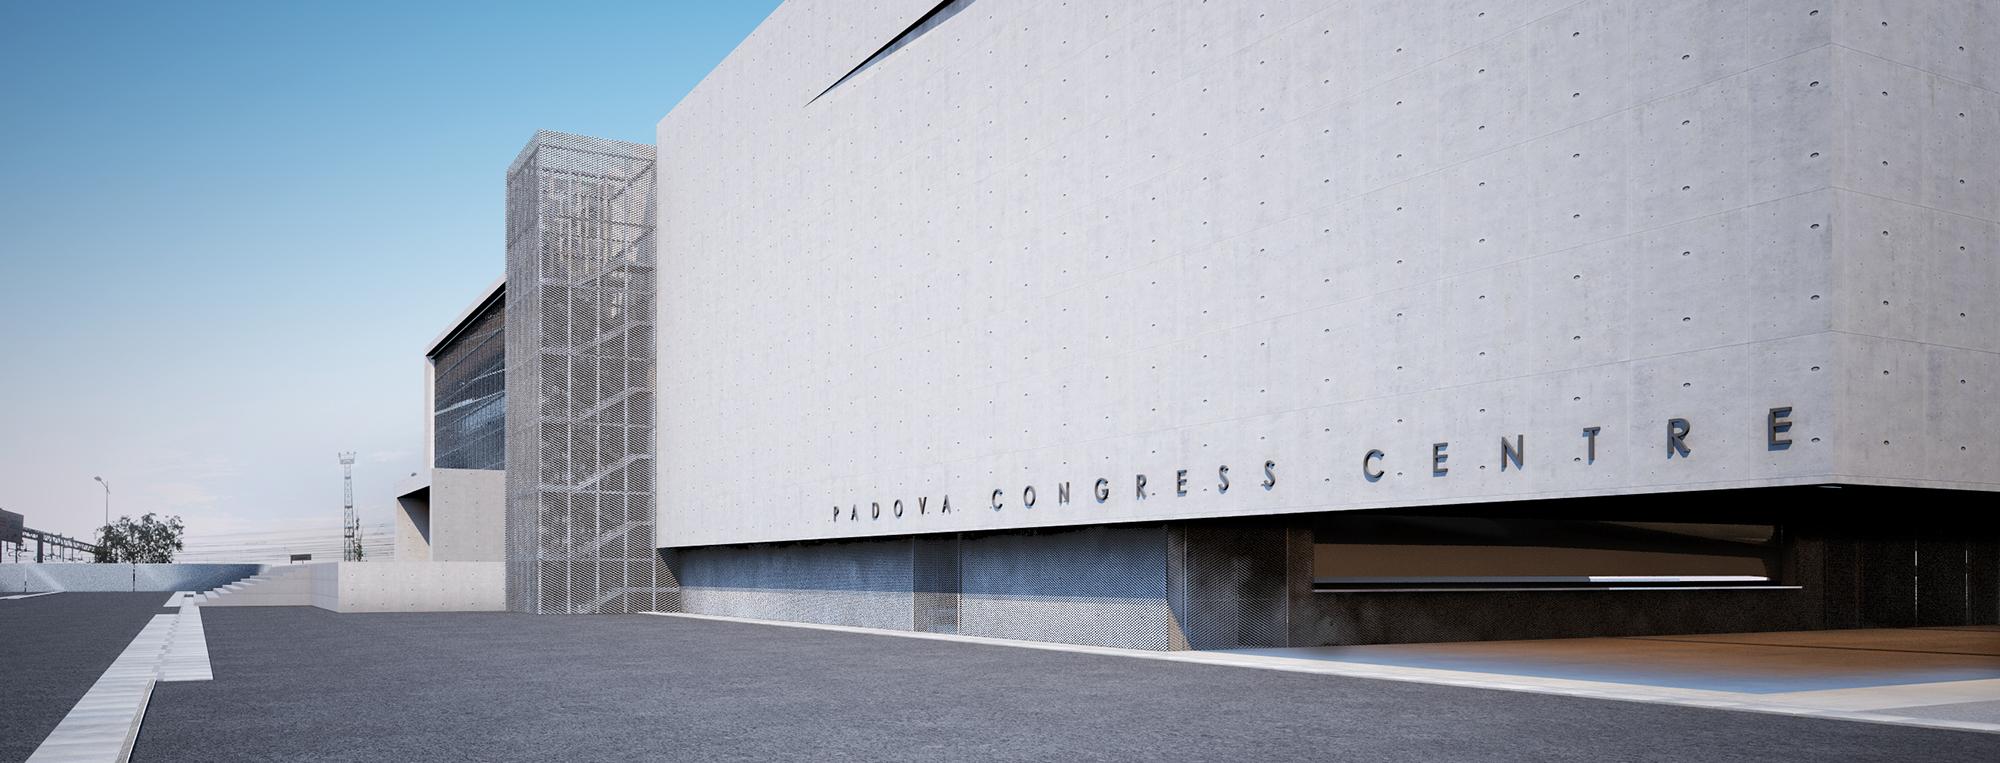 padova-congress-02.jpg